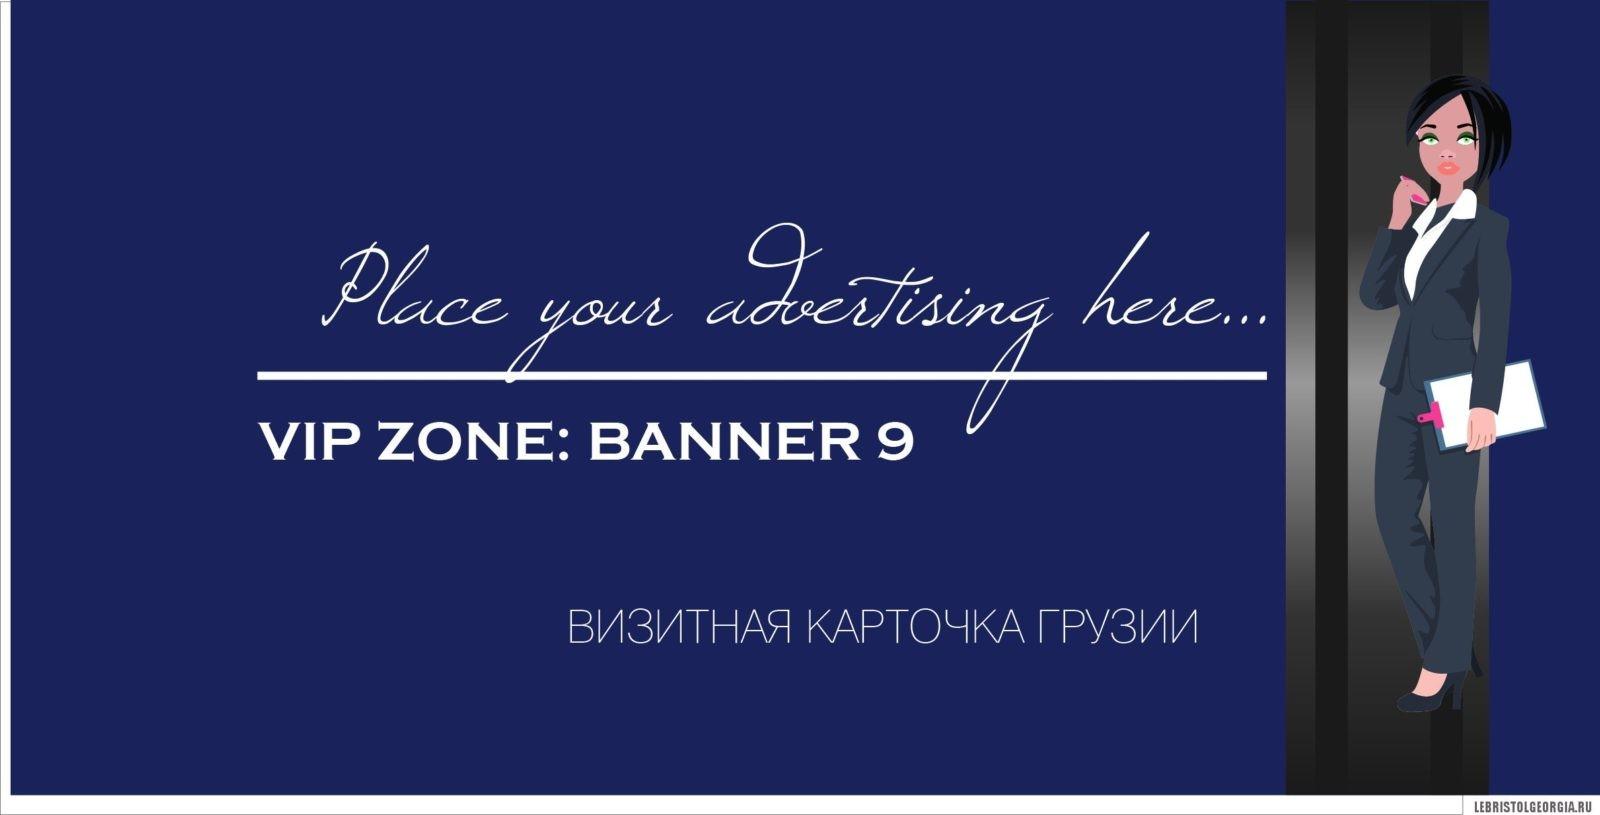 VIP banner 9